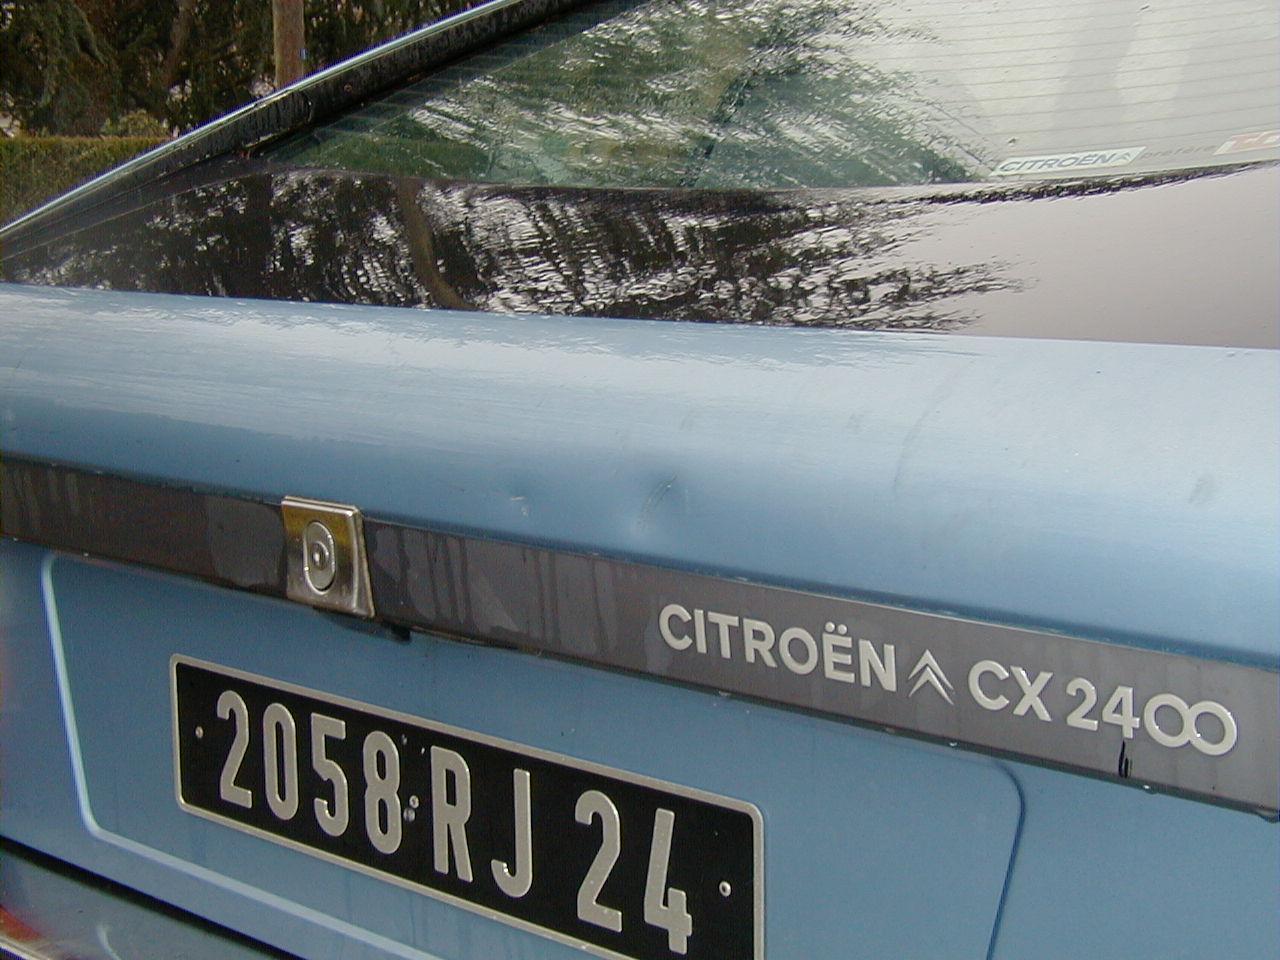 5aa22bb3c62e9_CXGTI782.jpg.173e76d16aee3e5a0f8f6b4ee0cc70cf.jpg